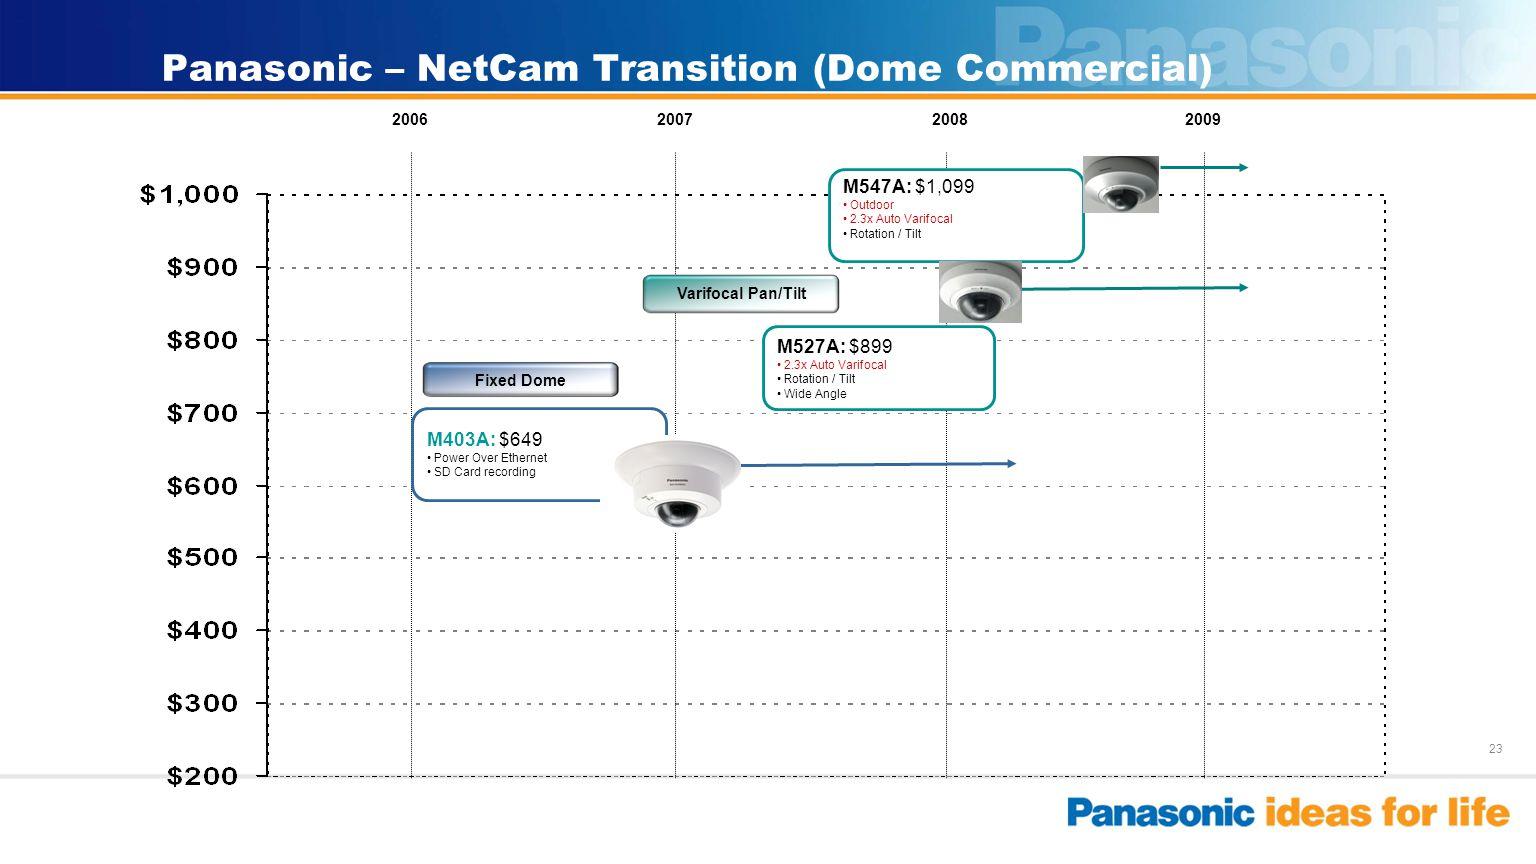 23 Panasonic – NetCam Transition (Dome Commercial) 2009200820072006 Varifocal Pan/Tilt M527A: $899 2.3x Auto Varifocal Rotation / Tilt Wide Angle Fixe